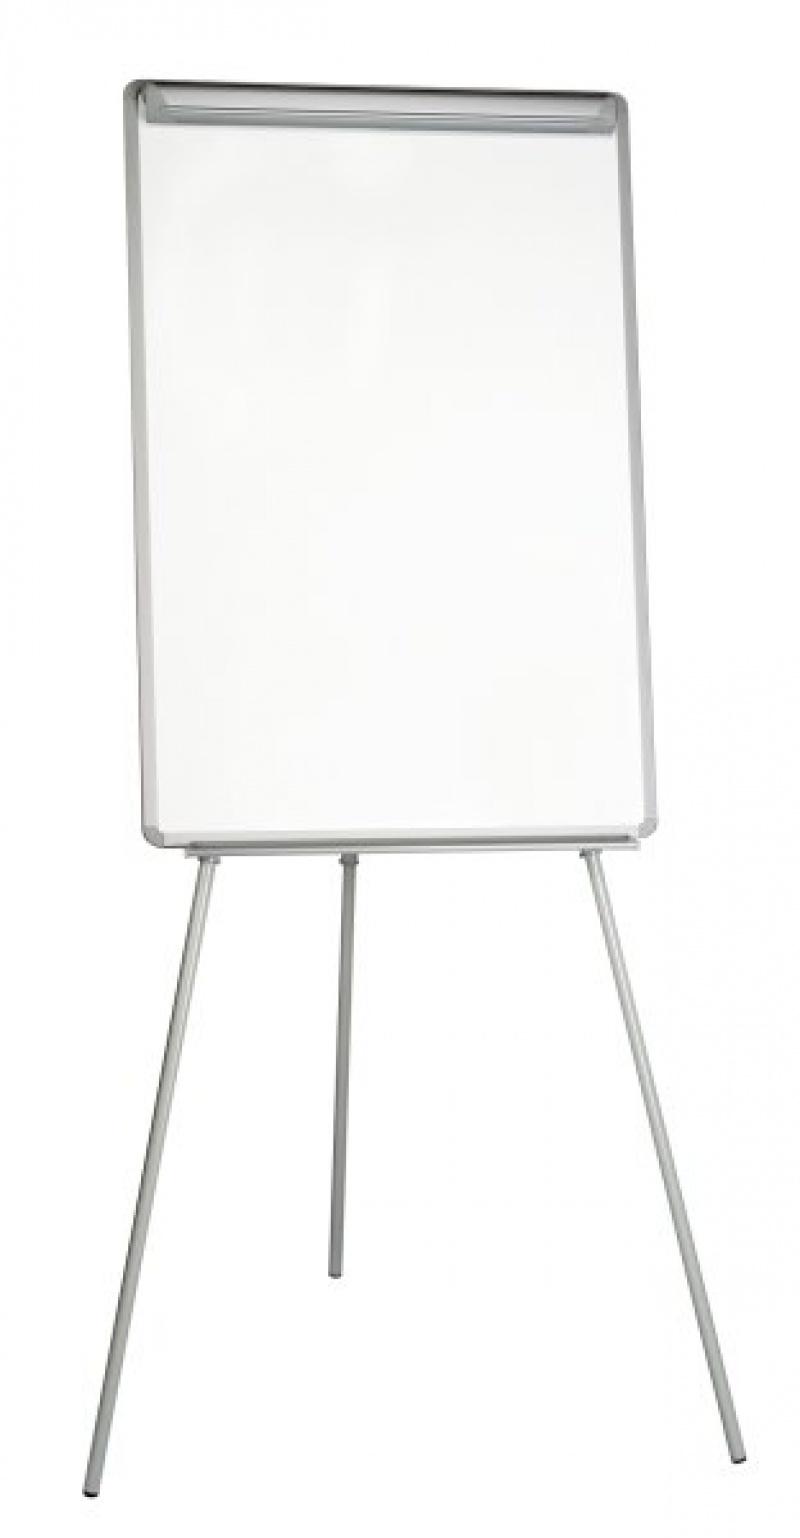 Flipchart Tripod Easel BI-OFFICE, 70x102cm, Magnetic Dry-wipe Board, plastic frame